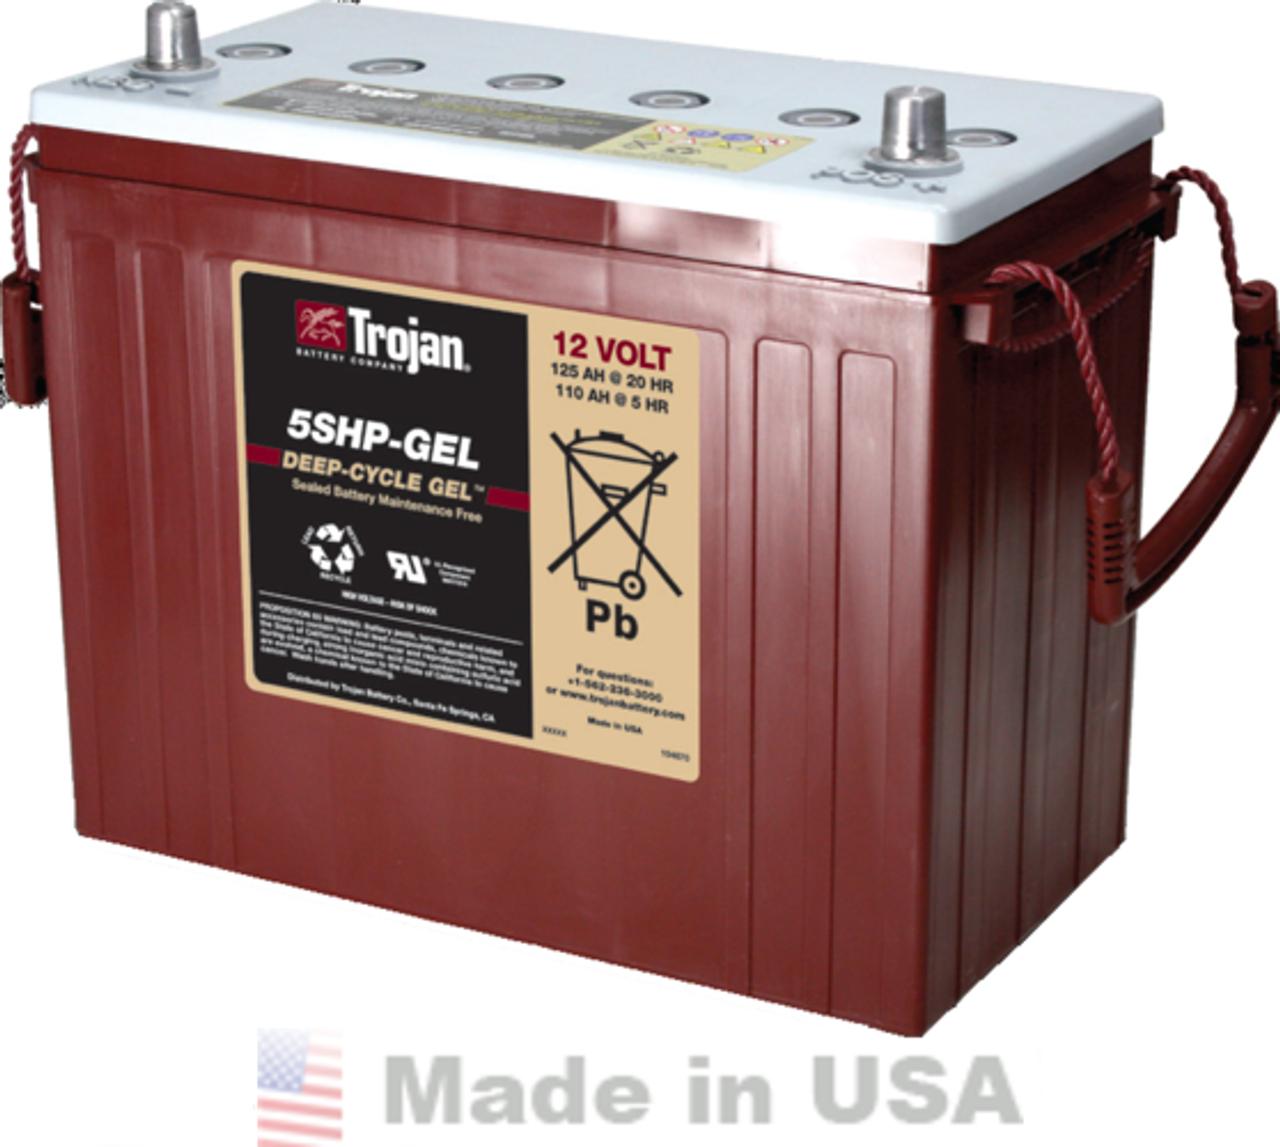 Trojan 5SHP-GEL 12V, 125AH (20HR) Gel Battery